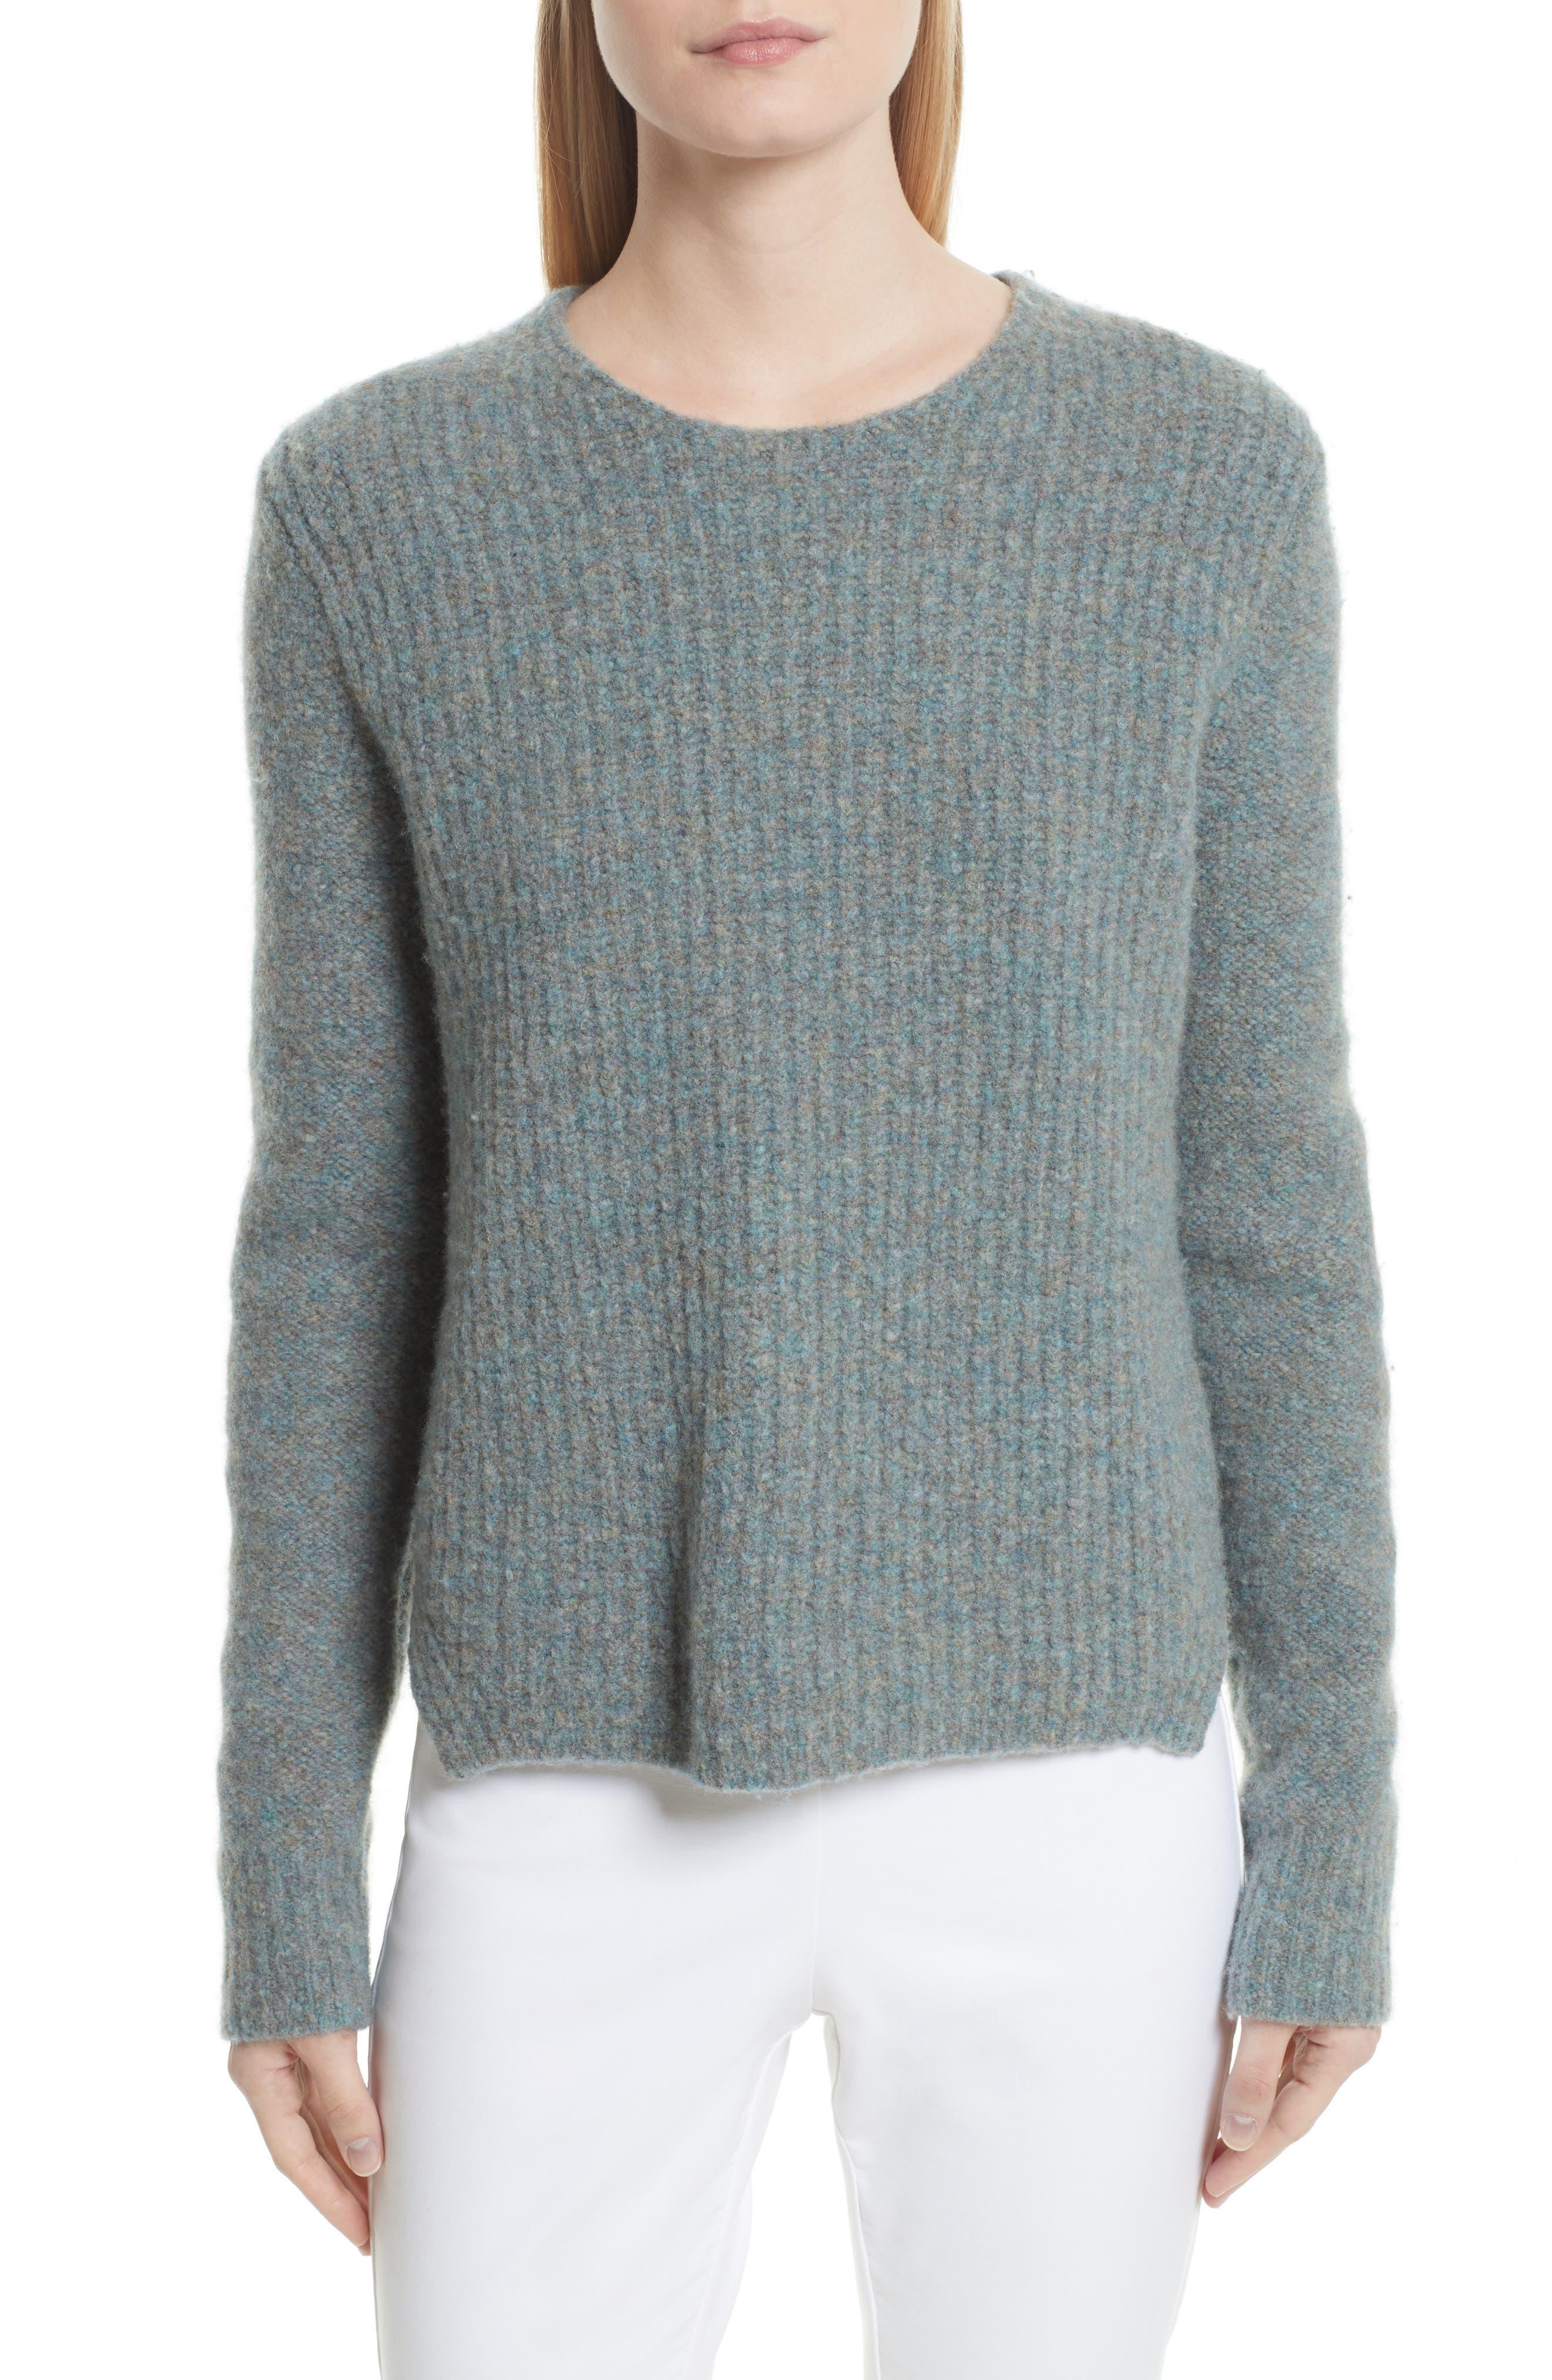 Francie Merino Wool Blend Sweater,                             Main thumbnail 1, color,                             Teal